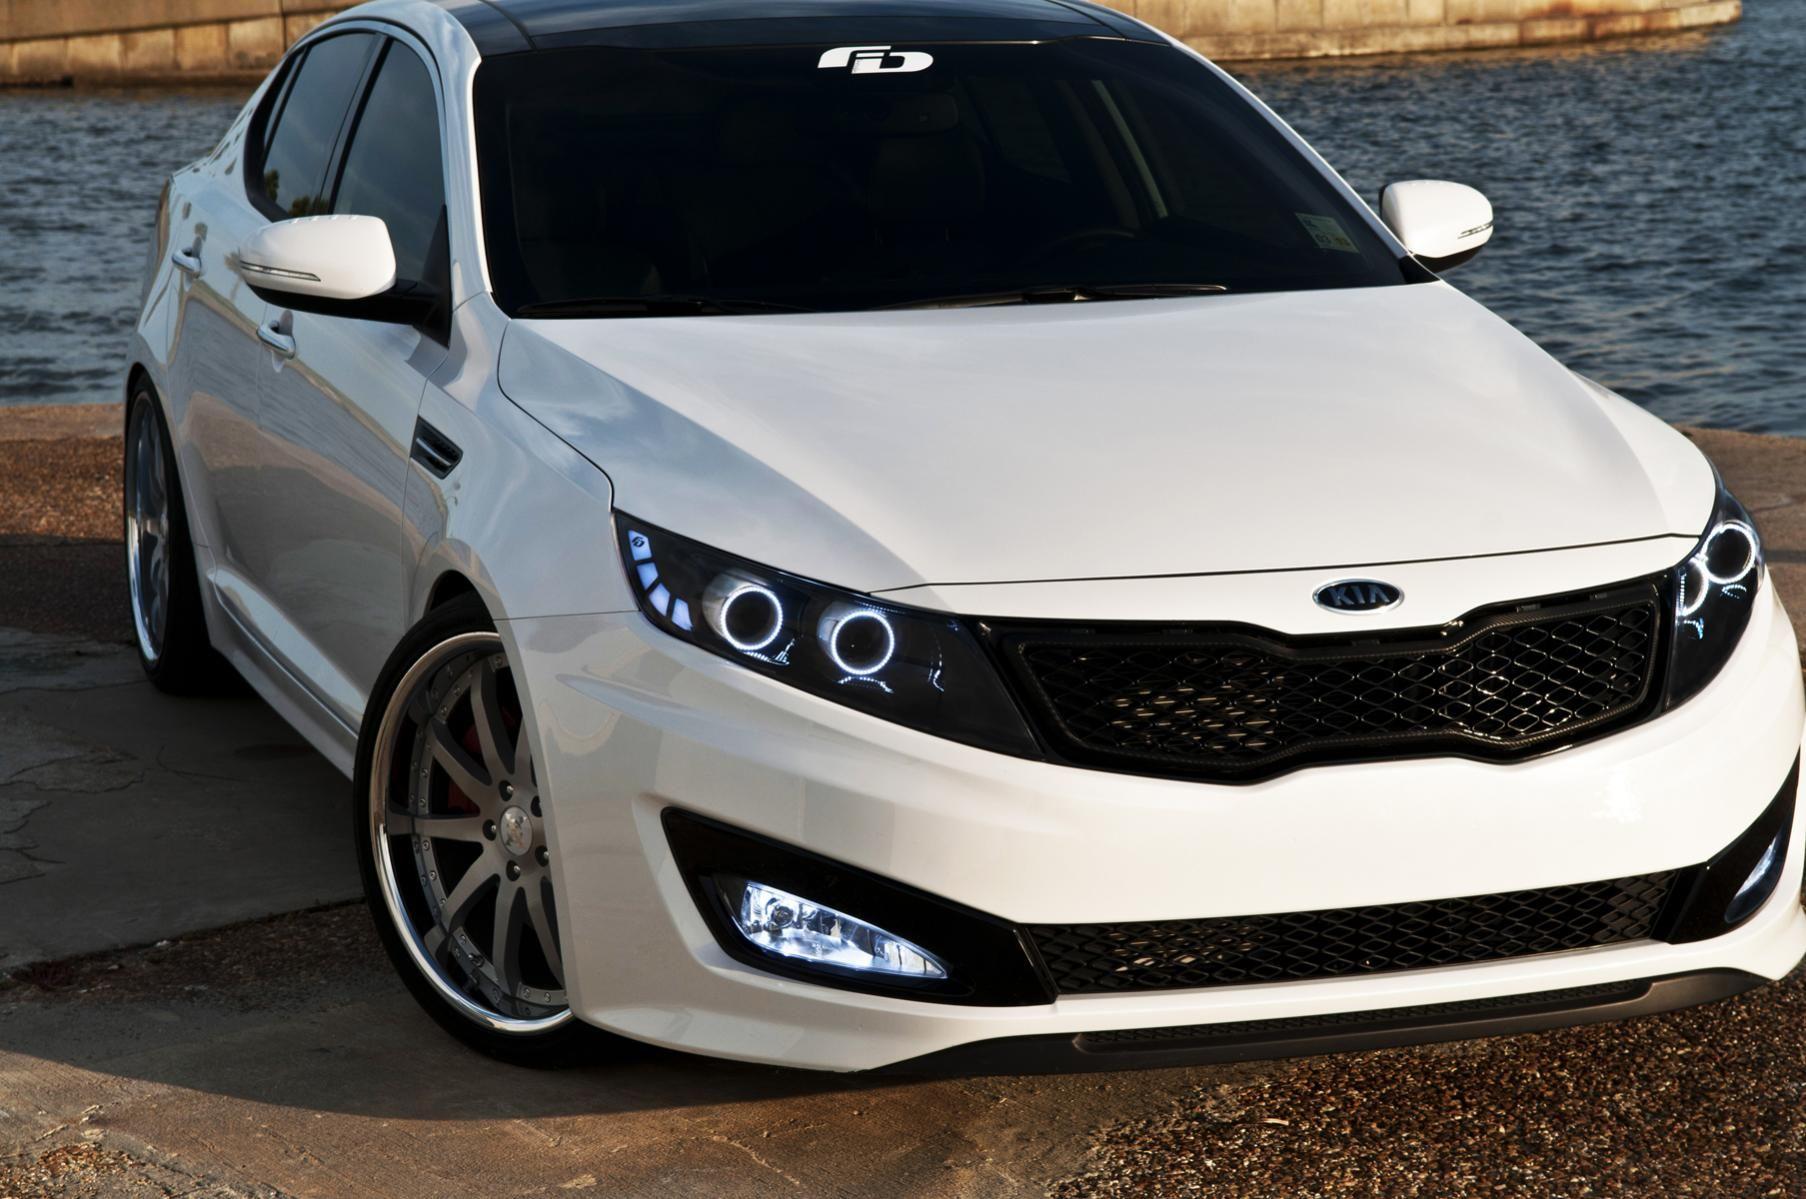 Bucket list pinterest kia optima dream cars and cars